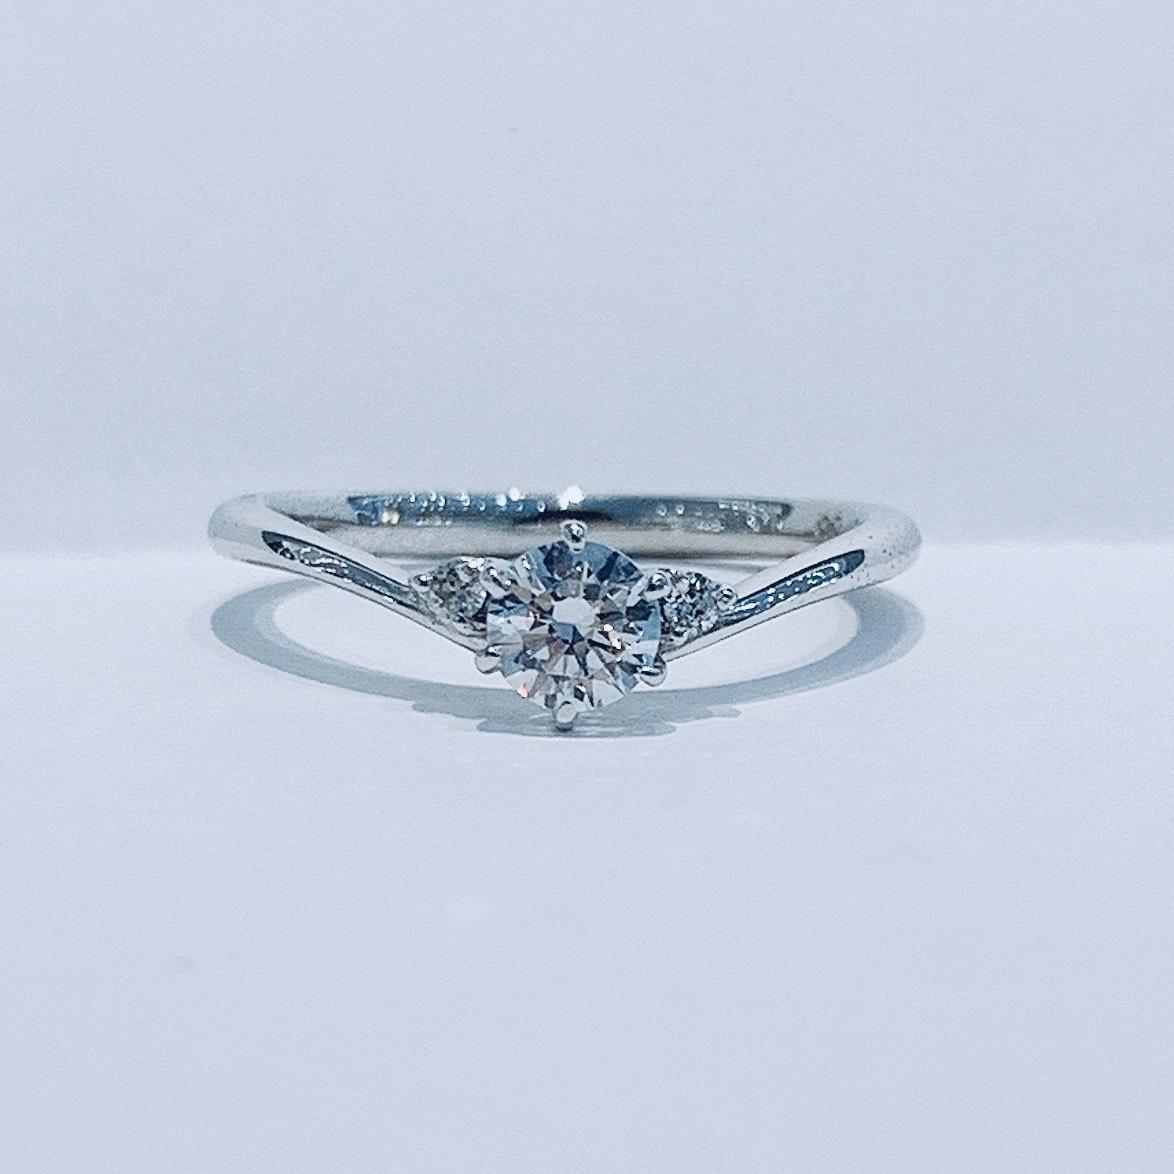 BROOCH 婚約指輪 エンゲージリング シンプルV字デザイン